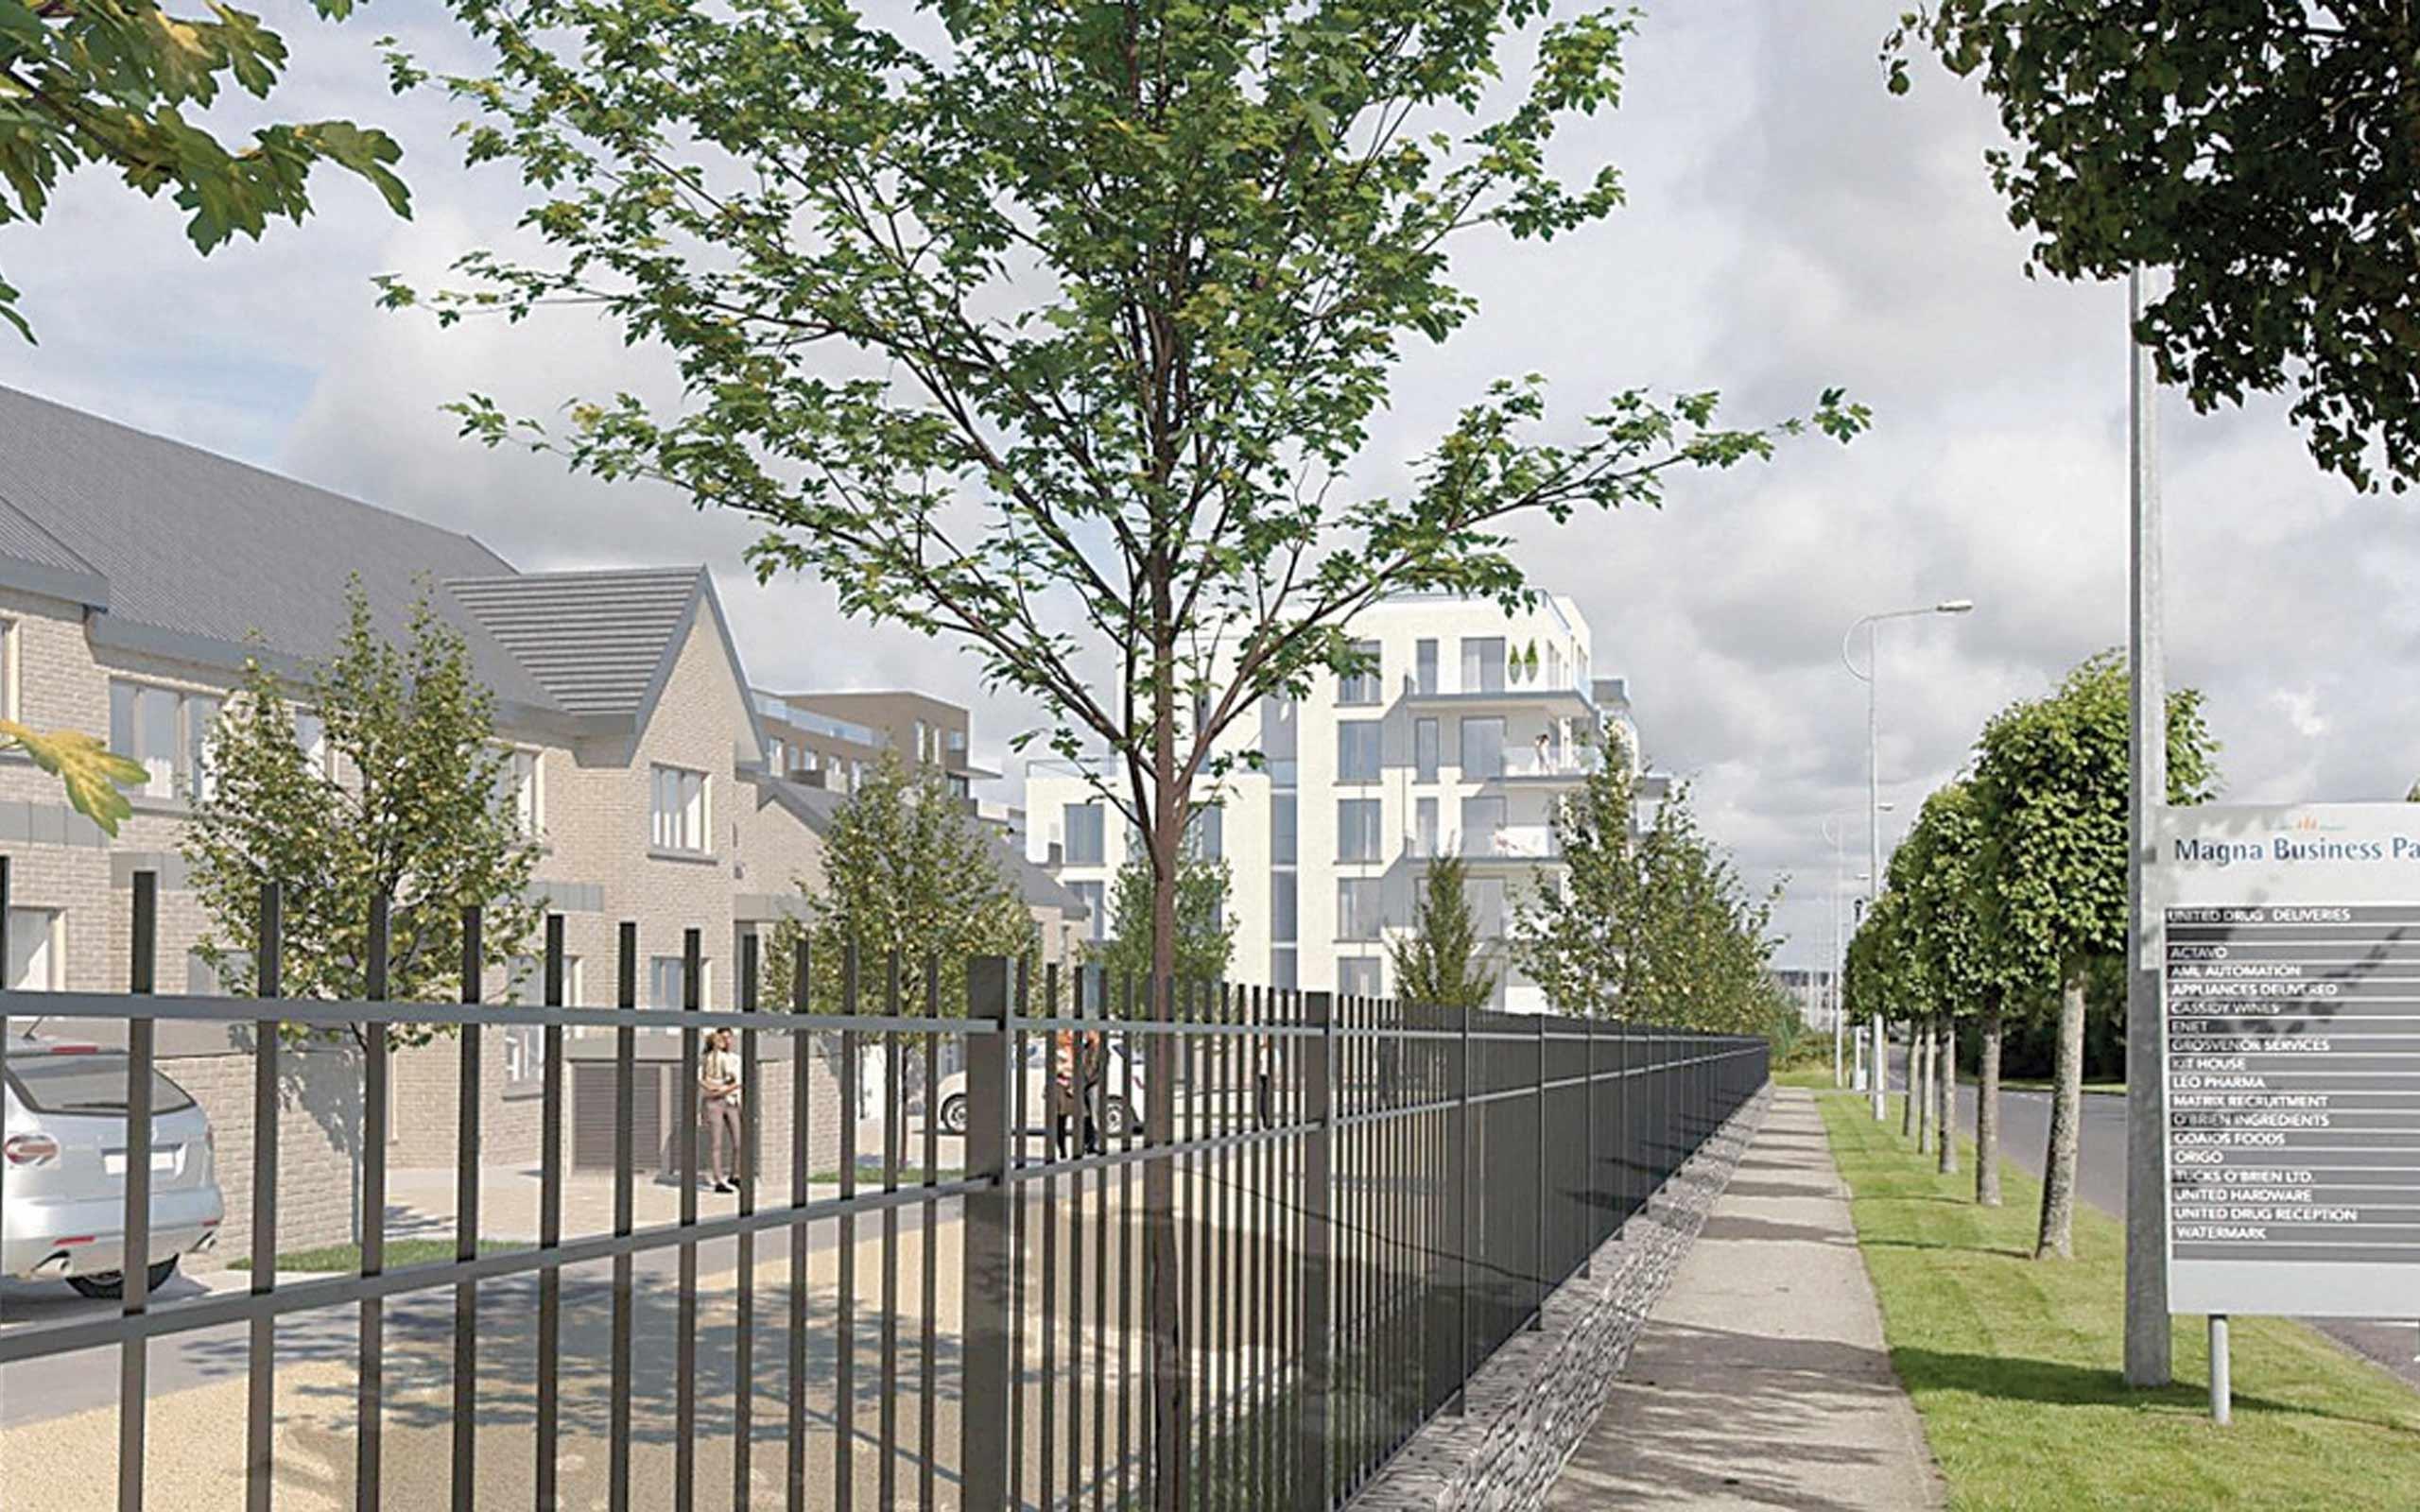 463 Units at Citywest Road, Citywest. Image Credit - McCauley Daye O'Connell Architects